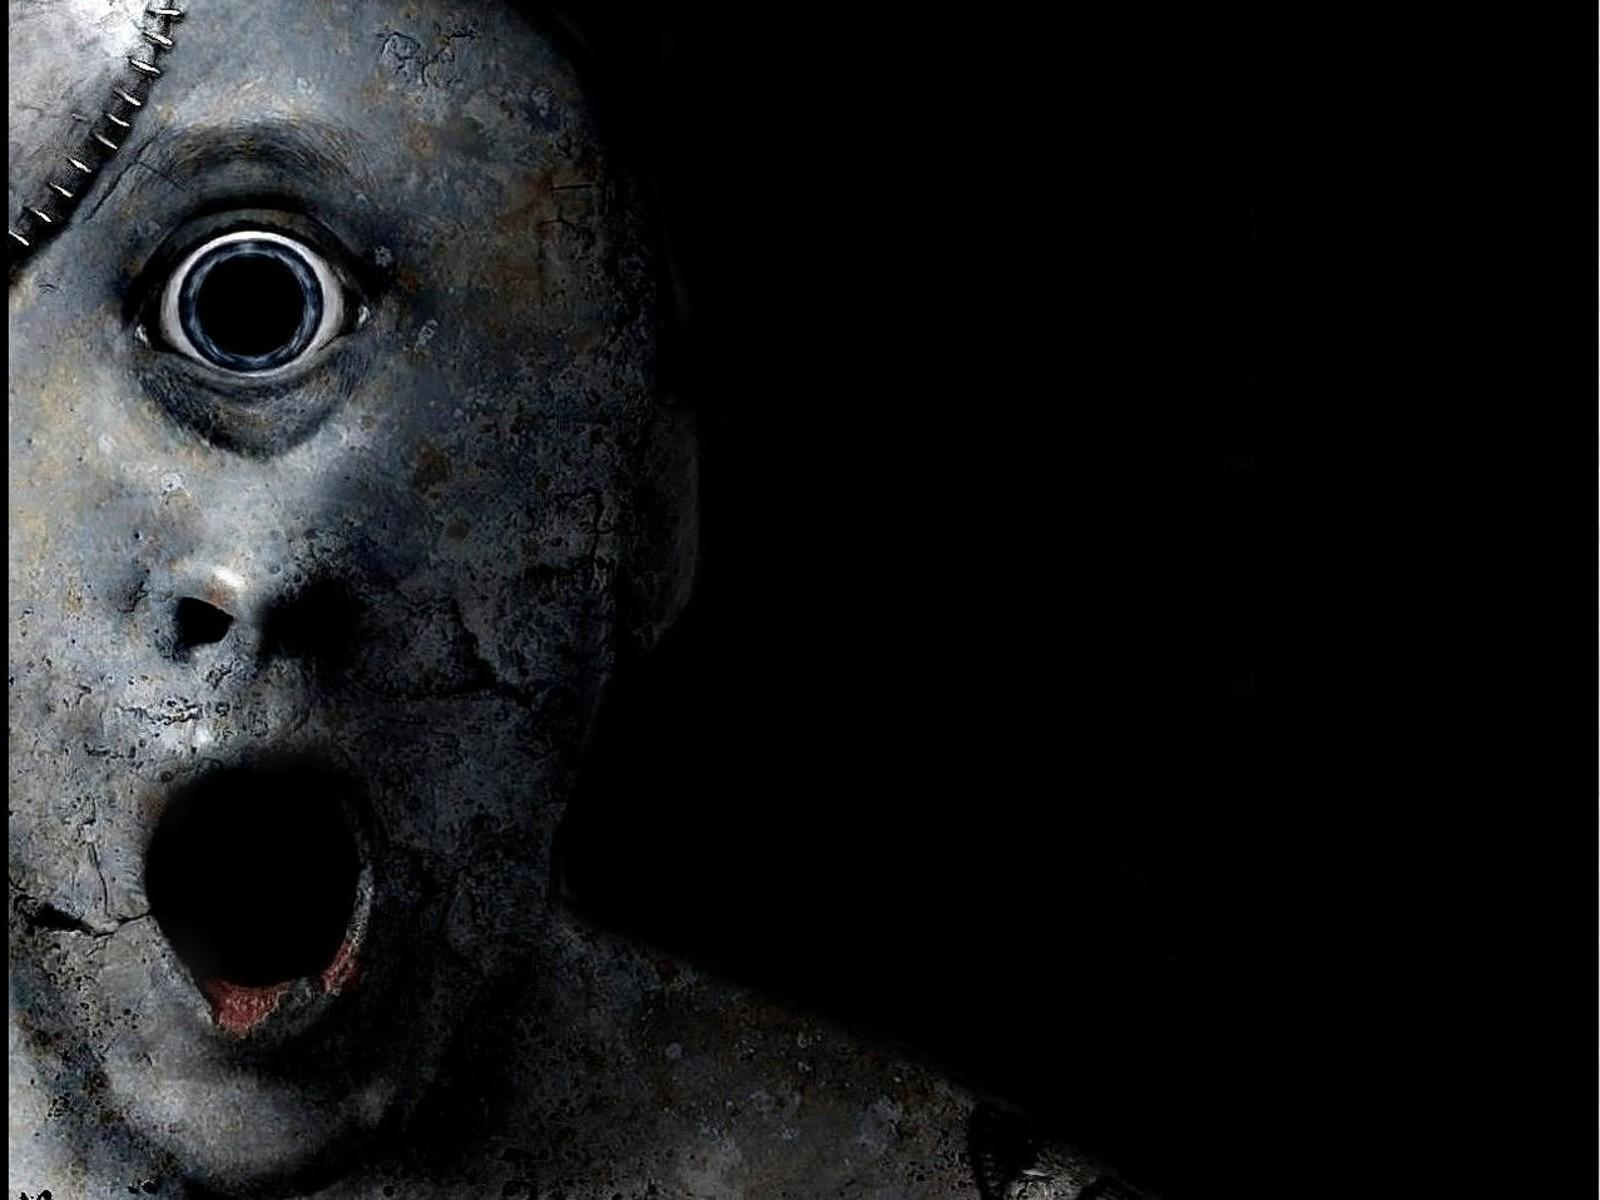 Horror Movies Wallpaper Download 1600x1200